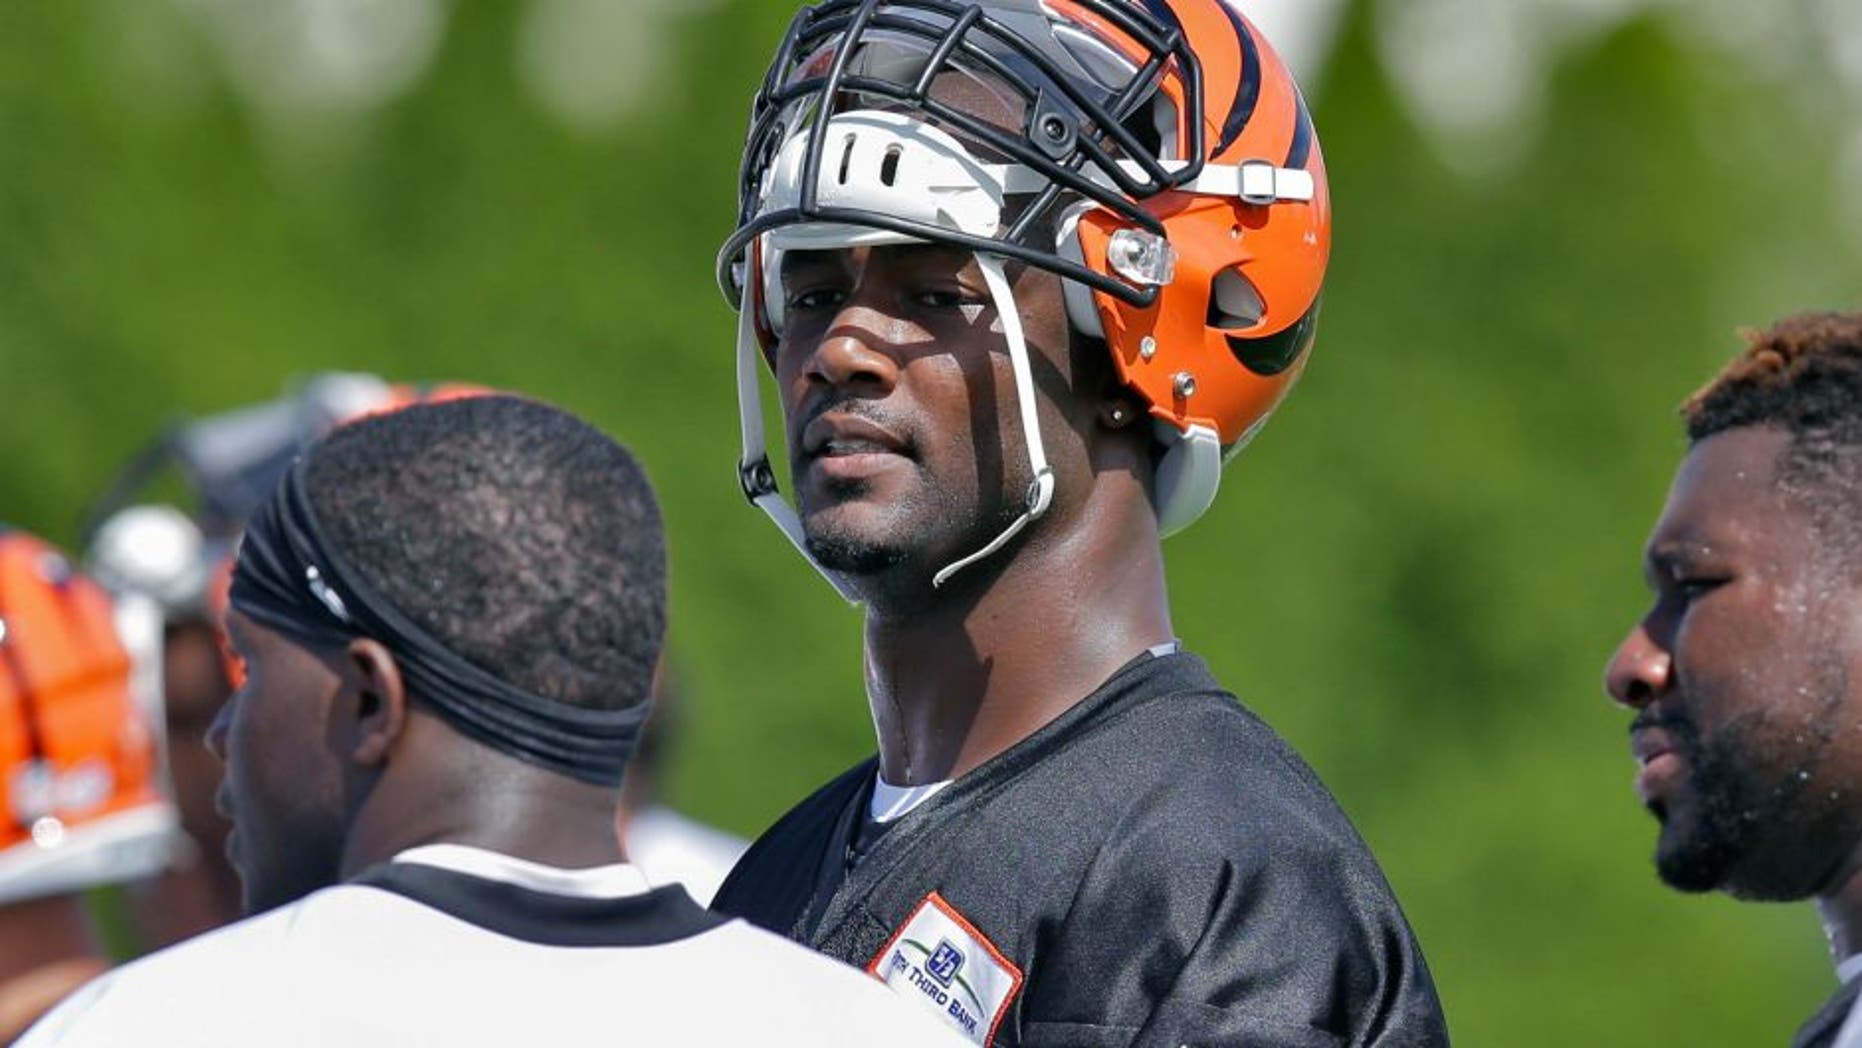 Cincinnati Bengals defensive end Michael Johnson participates in NFL football training camp, Saturday, Aug. 1, 2015, in Cincinnati. (AP Photo/John Minchillo)